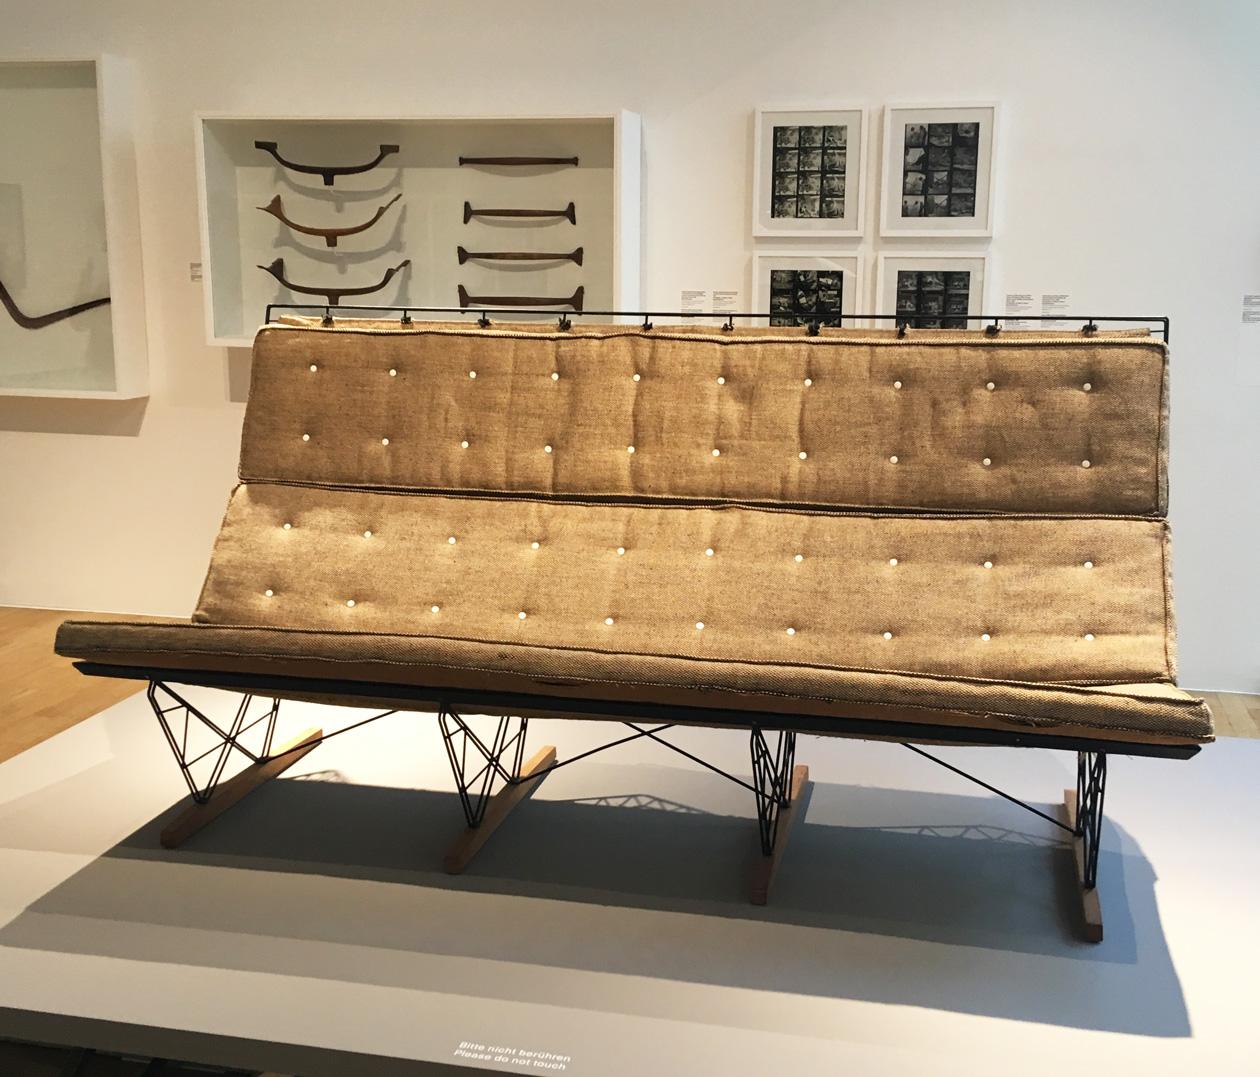 eames ausstellung im vitra design museum markanto. Black Bedroom Furniture Sets. Home Design Ideas